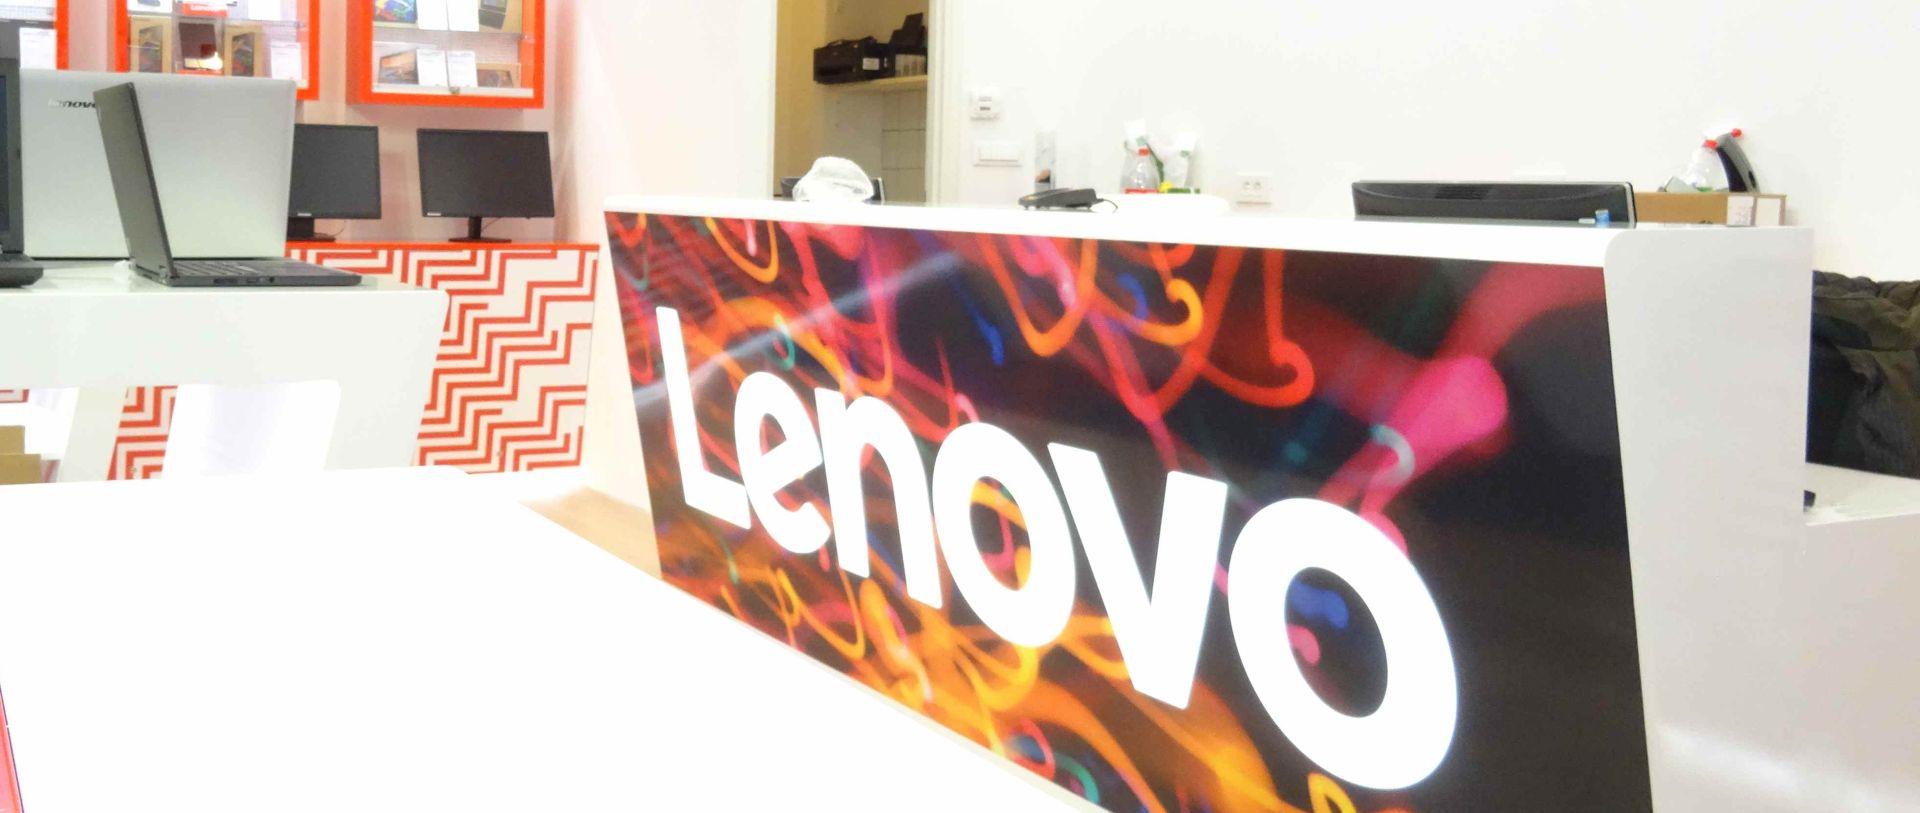 Otvoren je Lenovo Exclusive Store